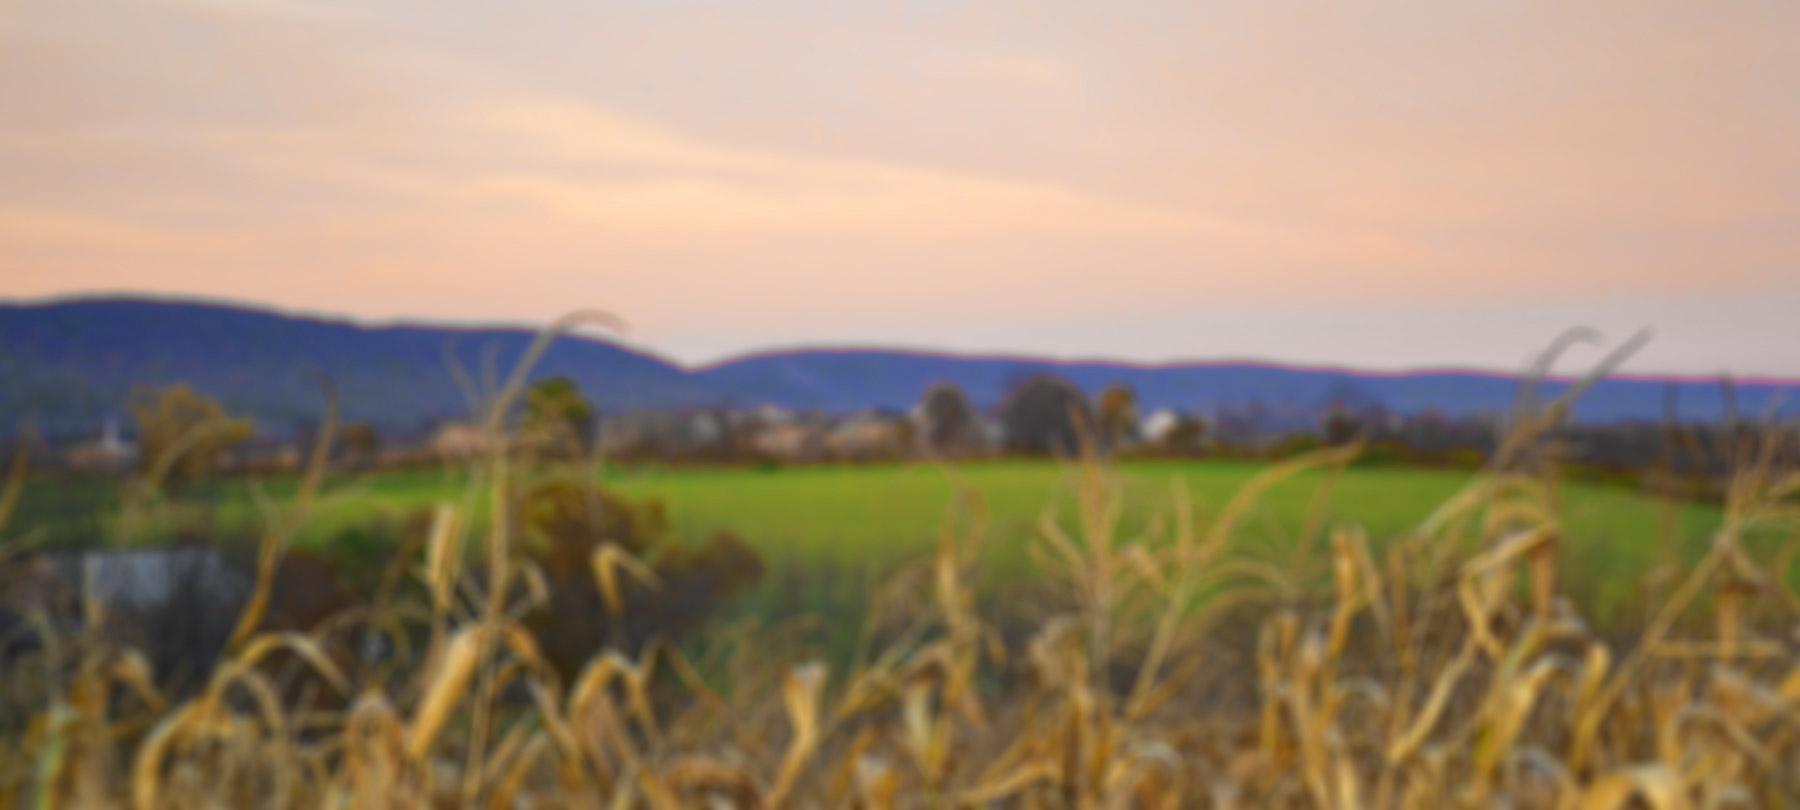 farmland header image